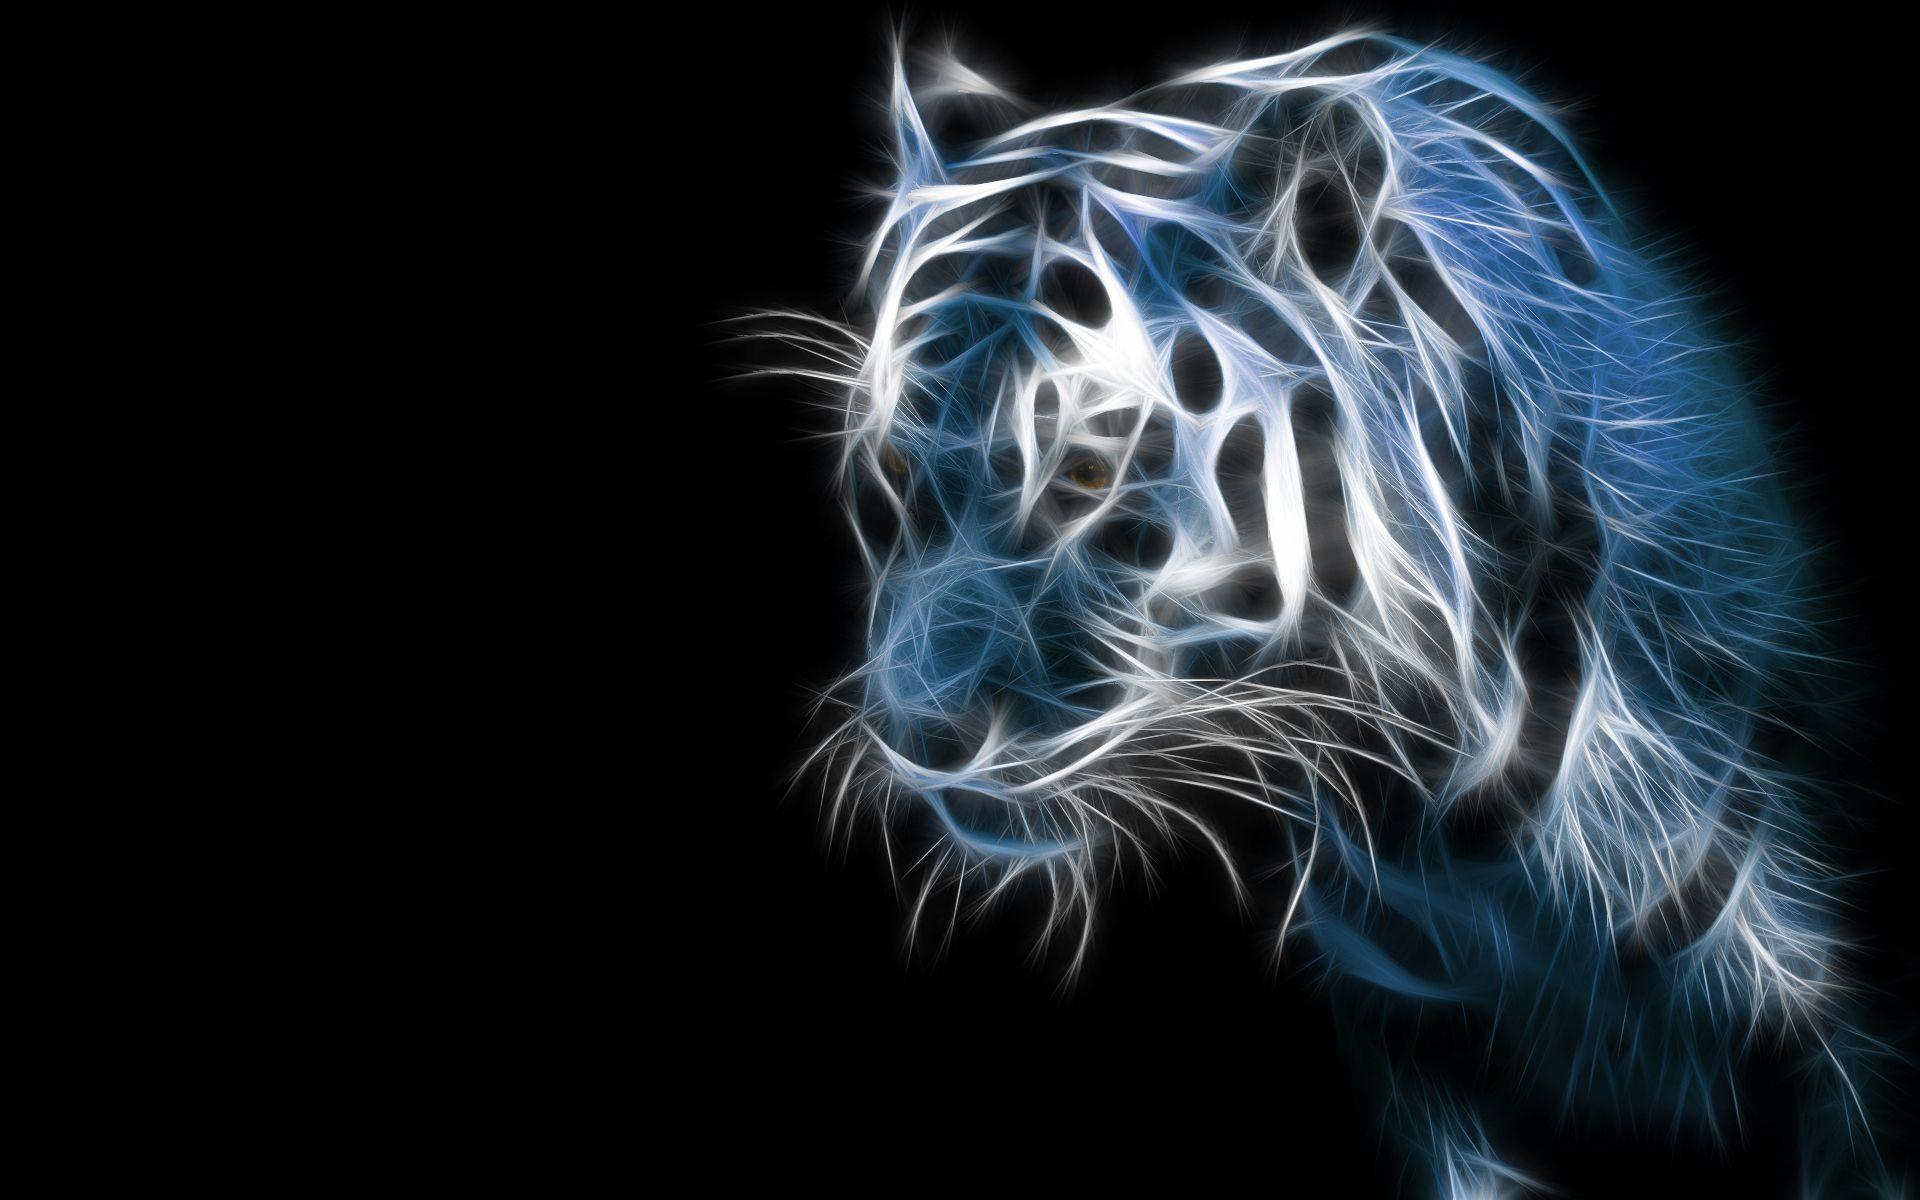 3D Wallpaper Wallpapers 3D BRIGHT EYES Tiger 1920x1200